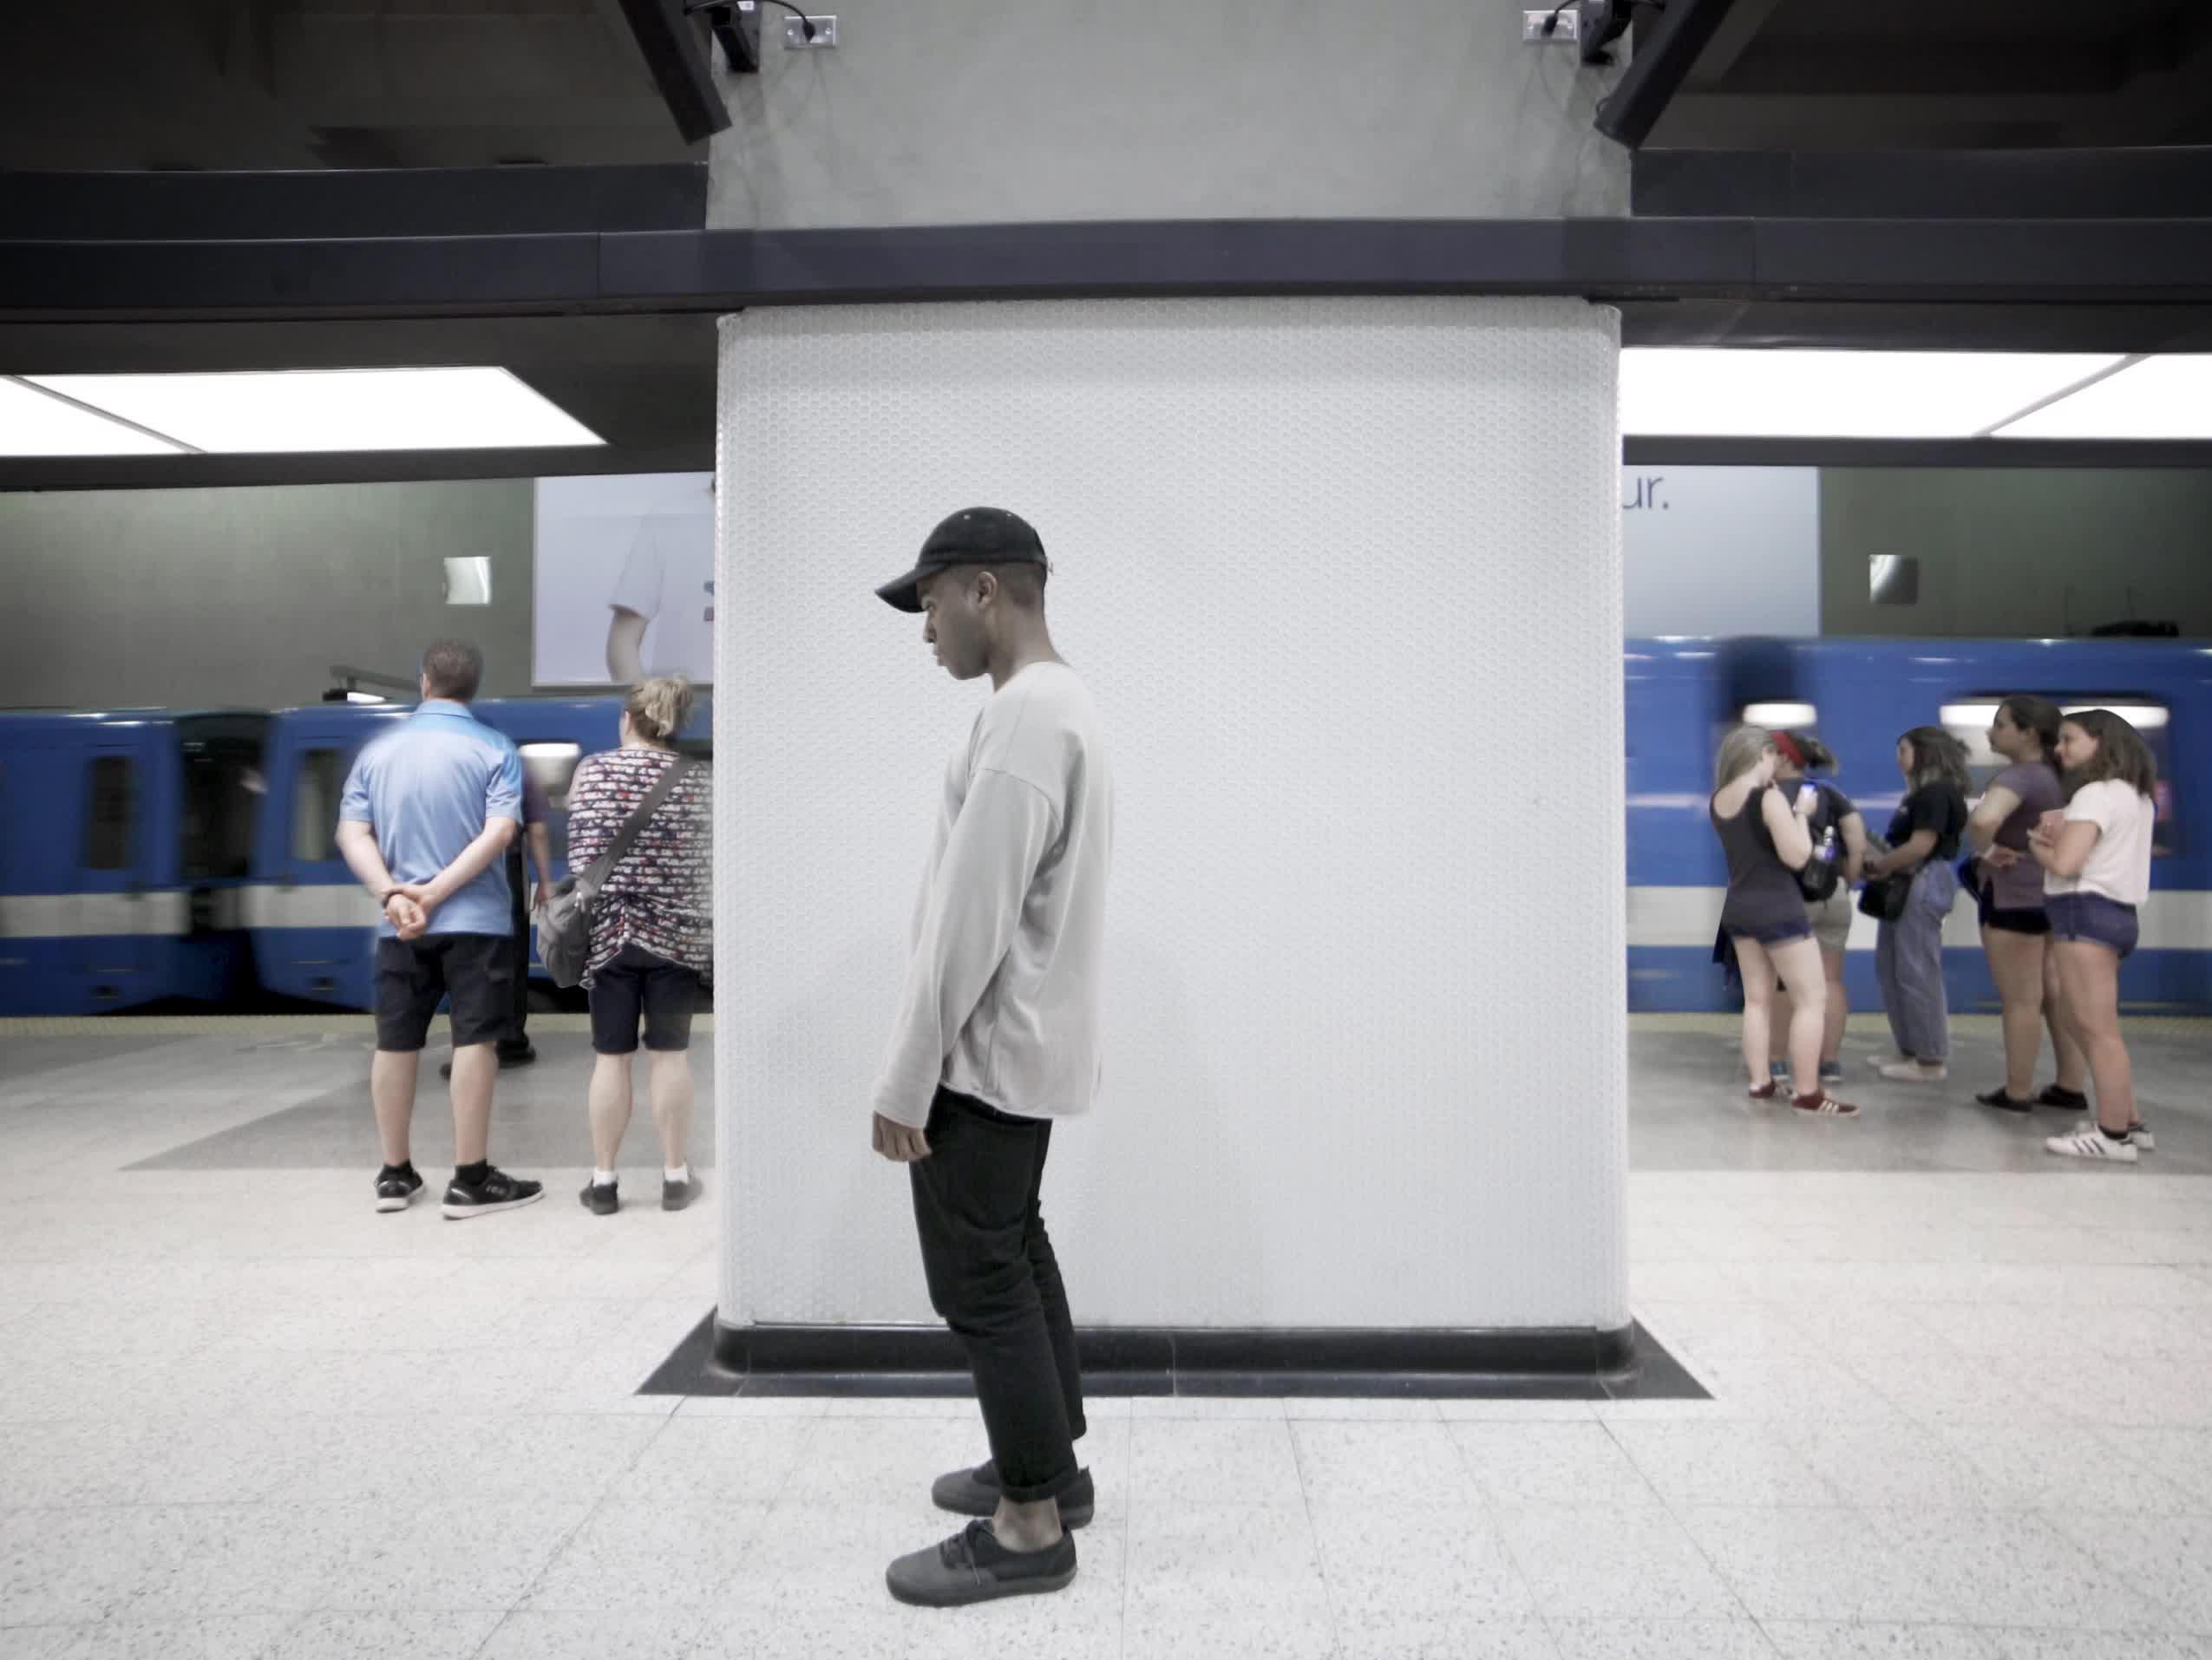 Montreal Metro Loop #10 GIFs